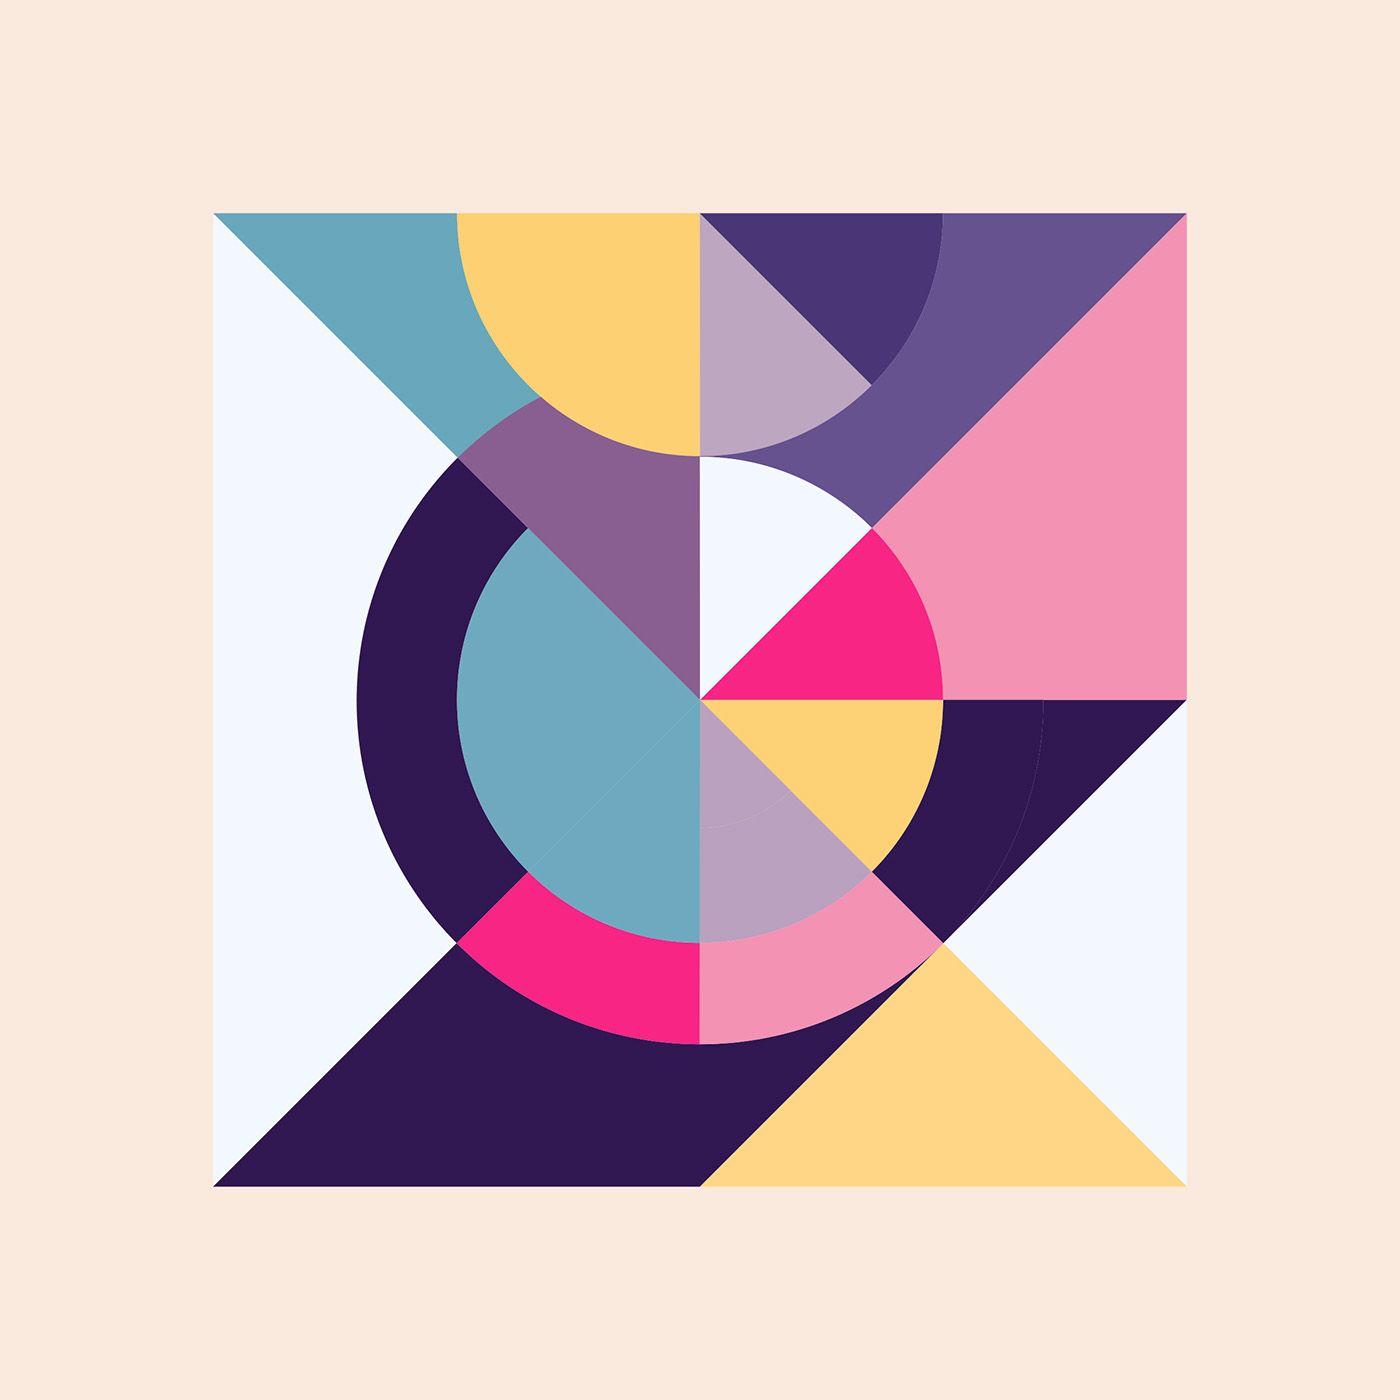 Kleurstaal On Behance Geometric Art Composition Art